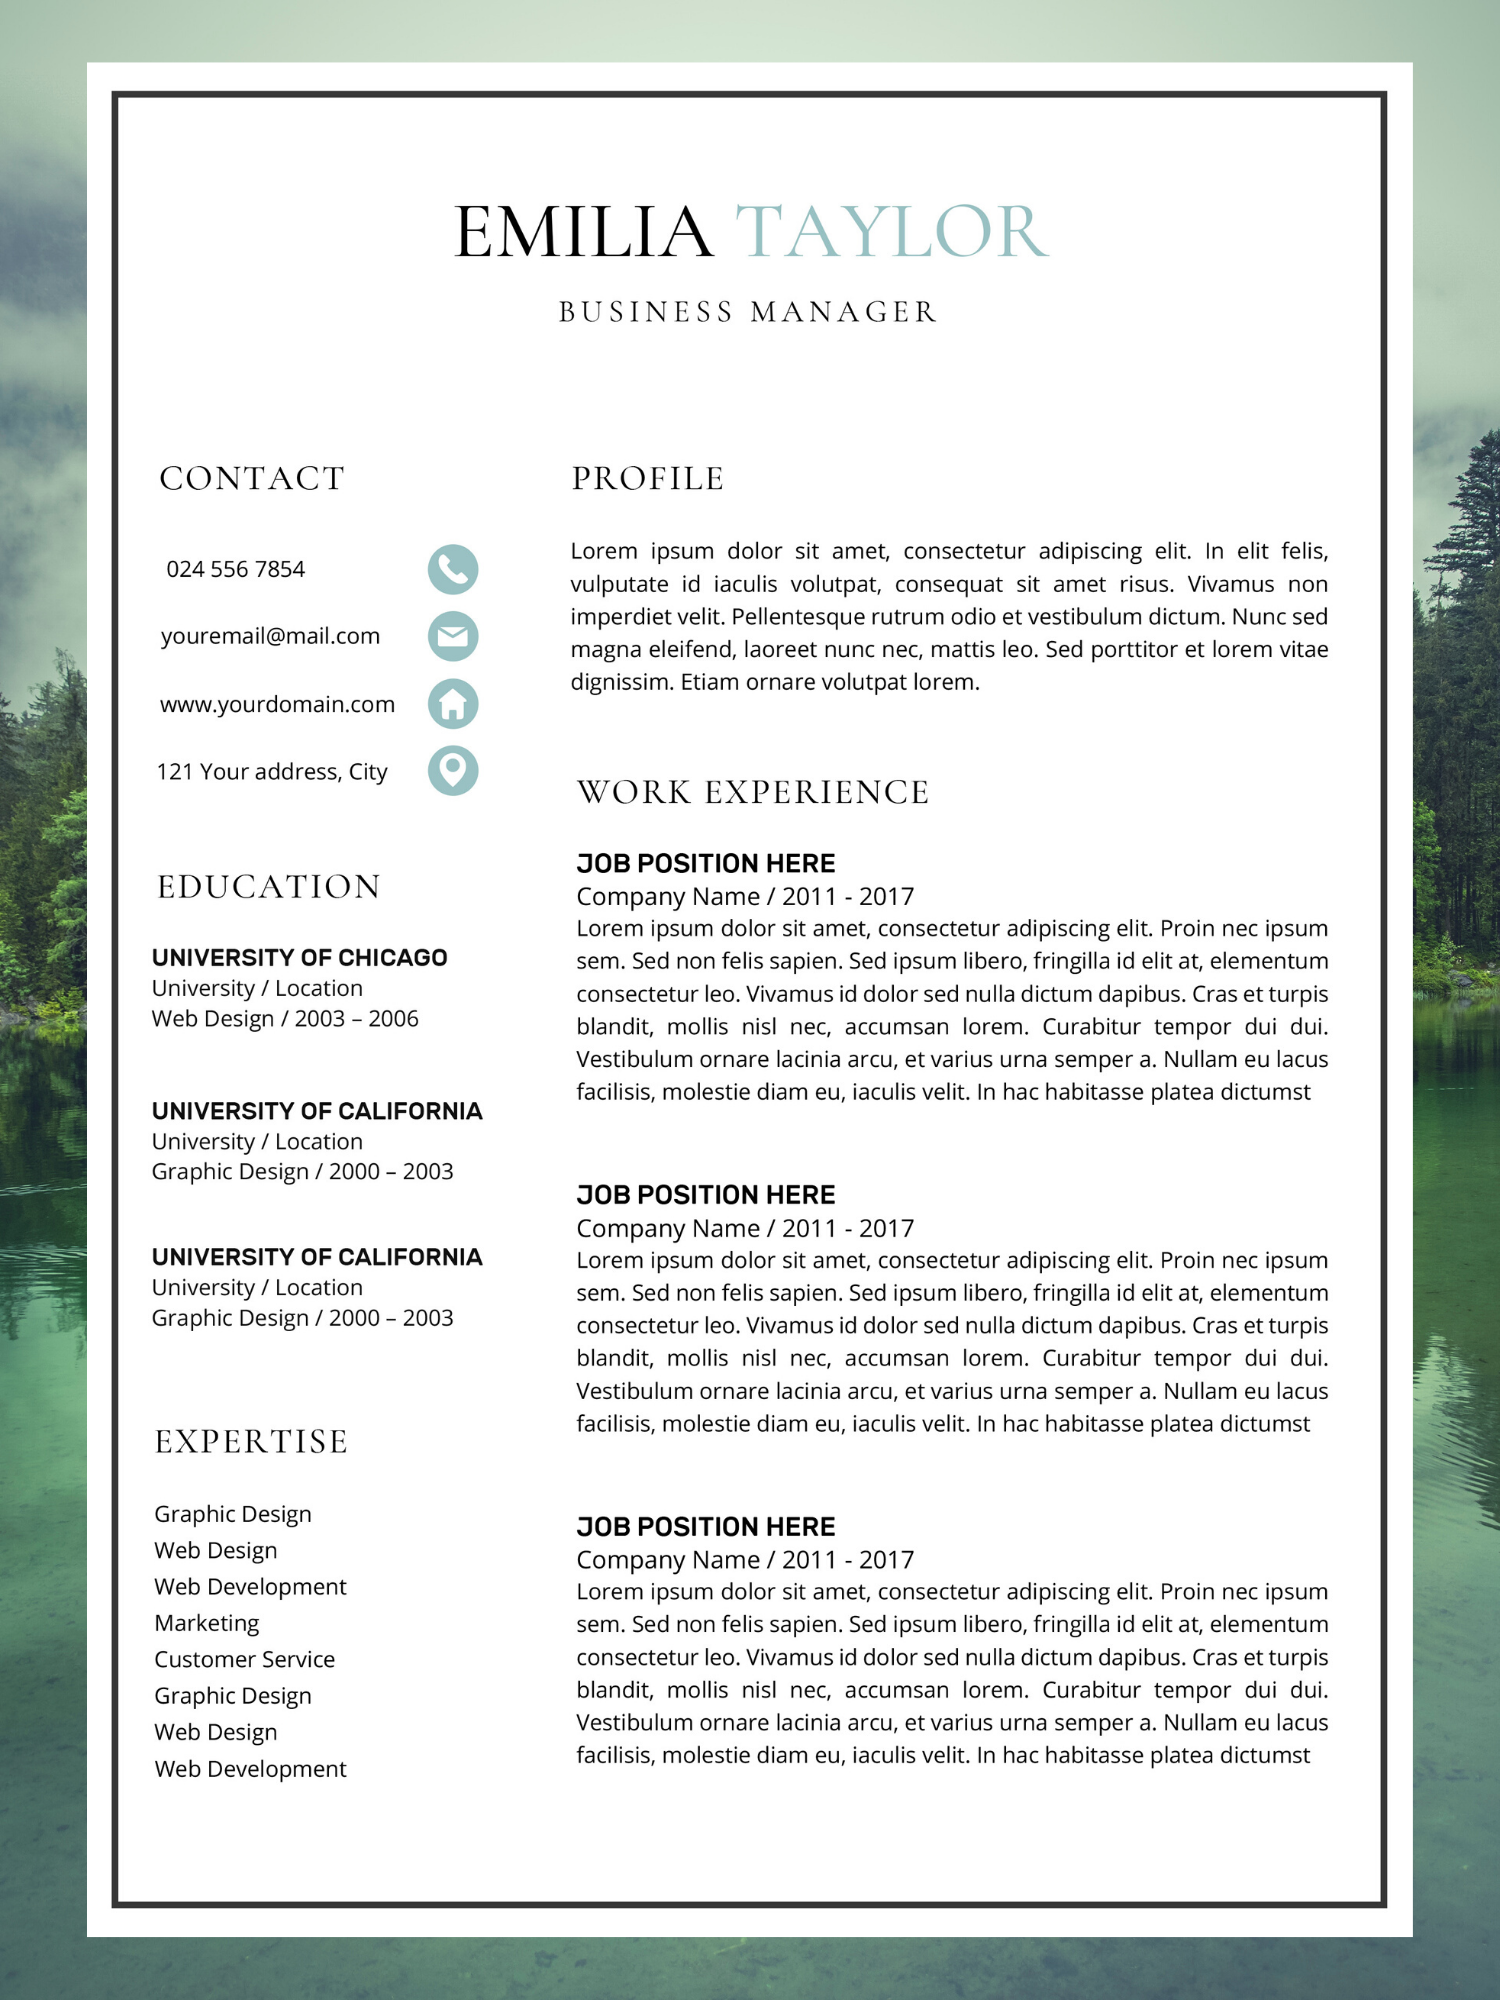 Business Resume Template Resume Template Emilia Taylor